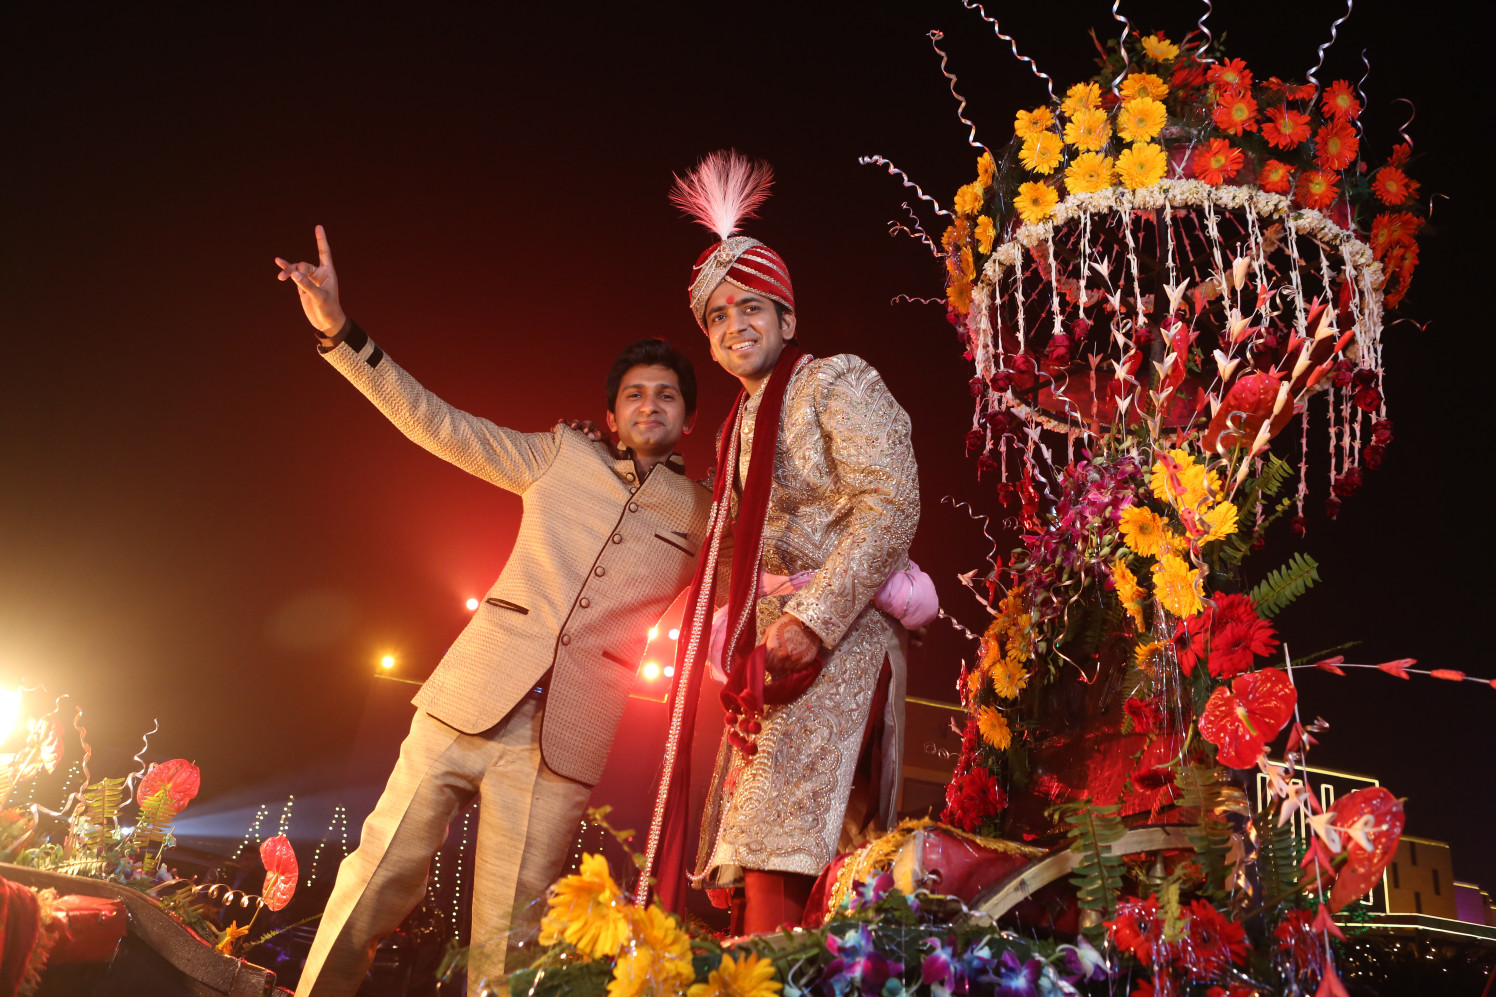 Groom Poses With a Wedding Guest by Amit Kumar Wedding-photography | Weddings Photos & Ideas